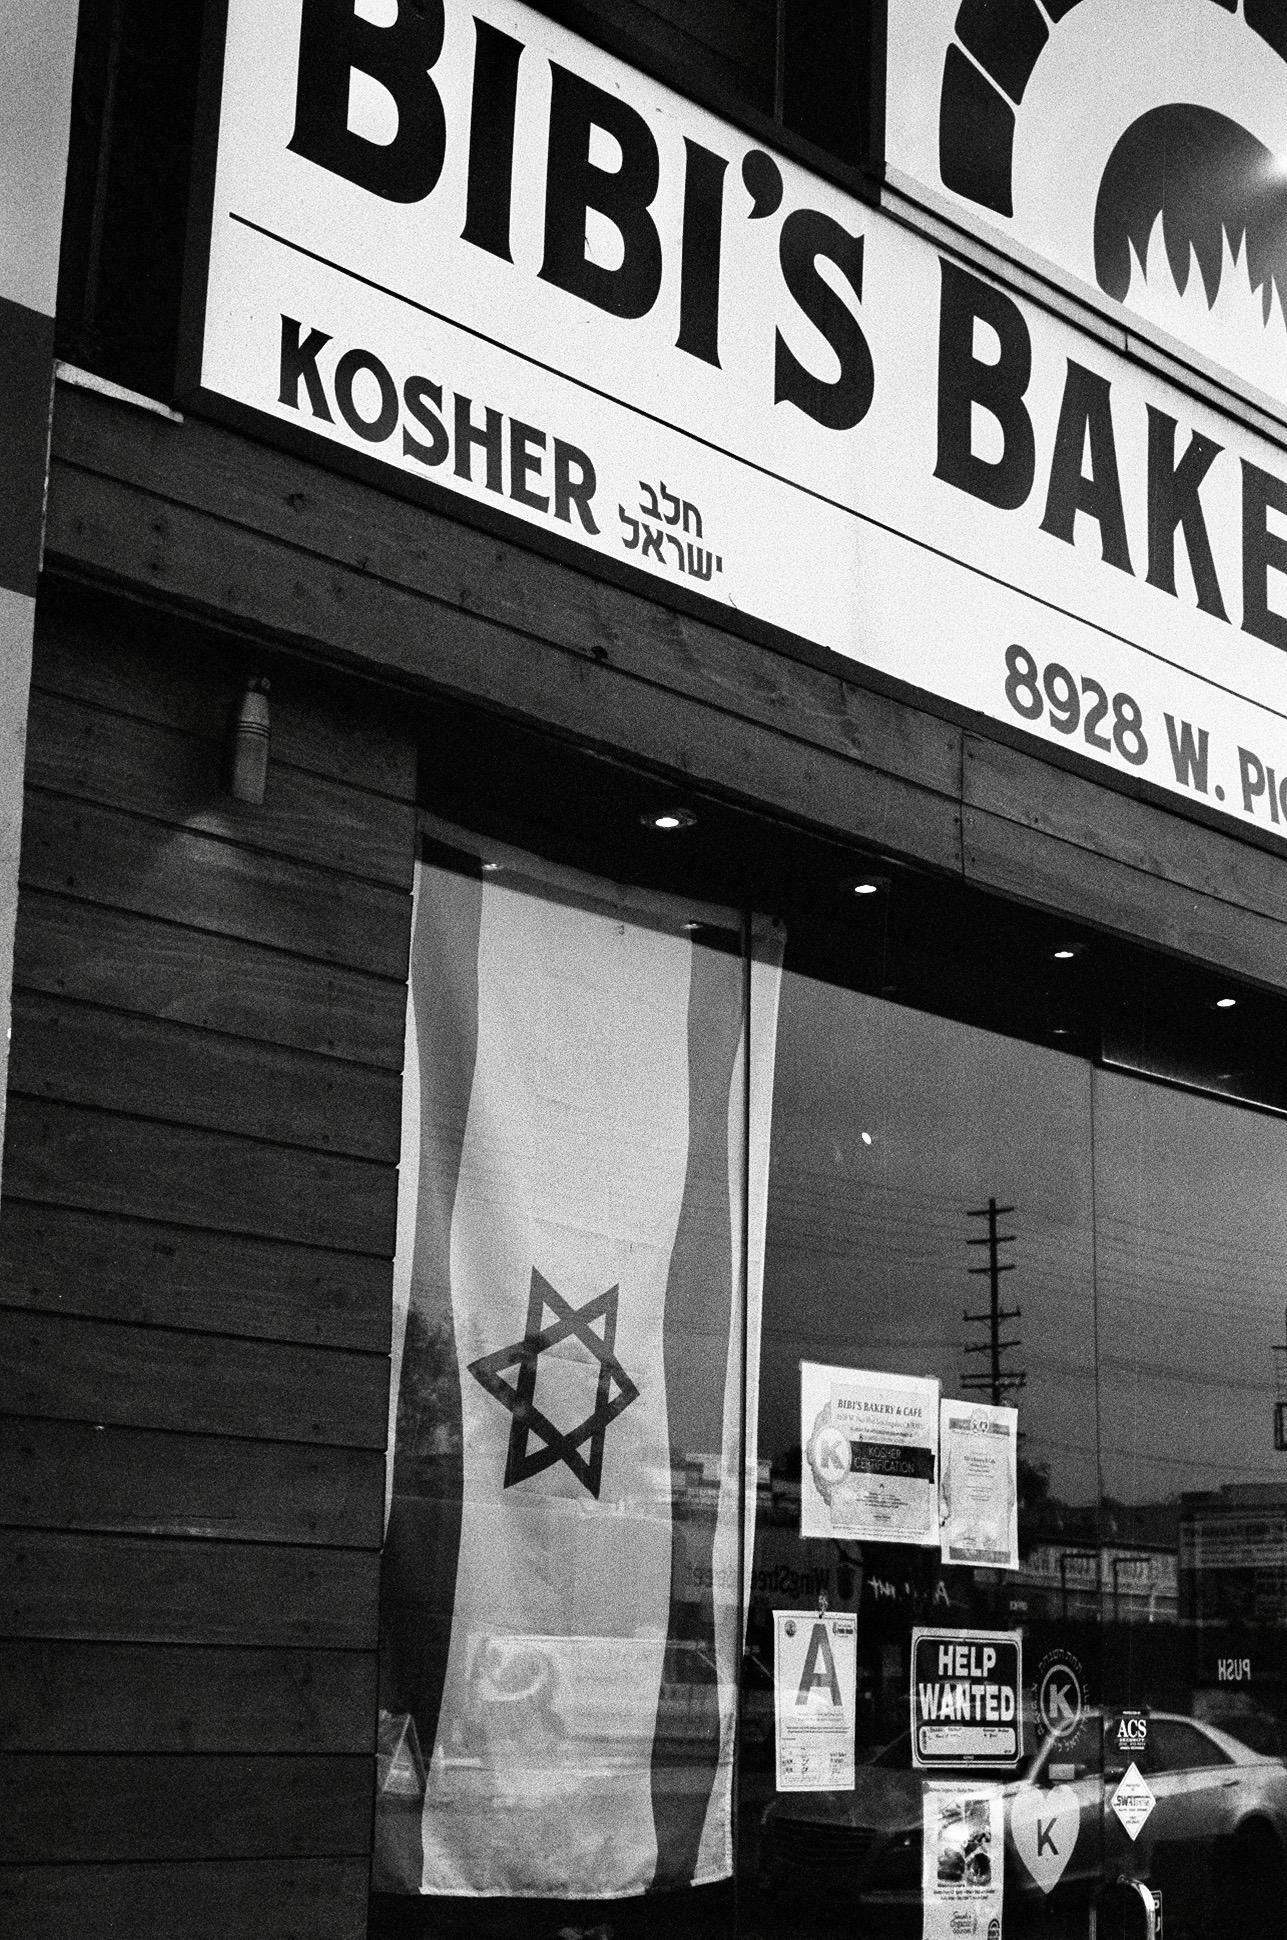 Bibi's Bakery Cafe . Pico-Robertson, Los Angeles.  Kodak Tri-X 400. Pentax K1000. Fletcher Berryman 2019.